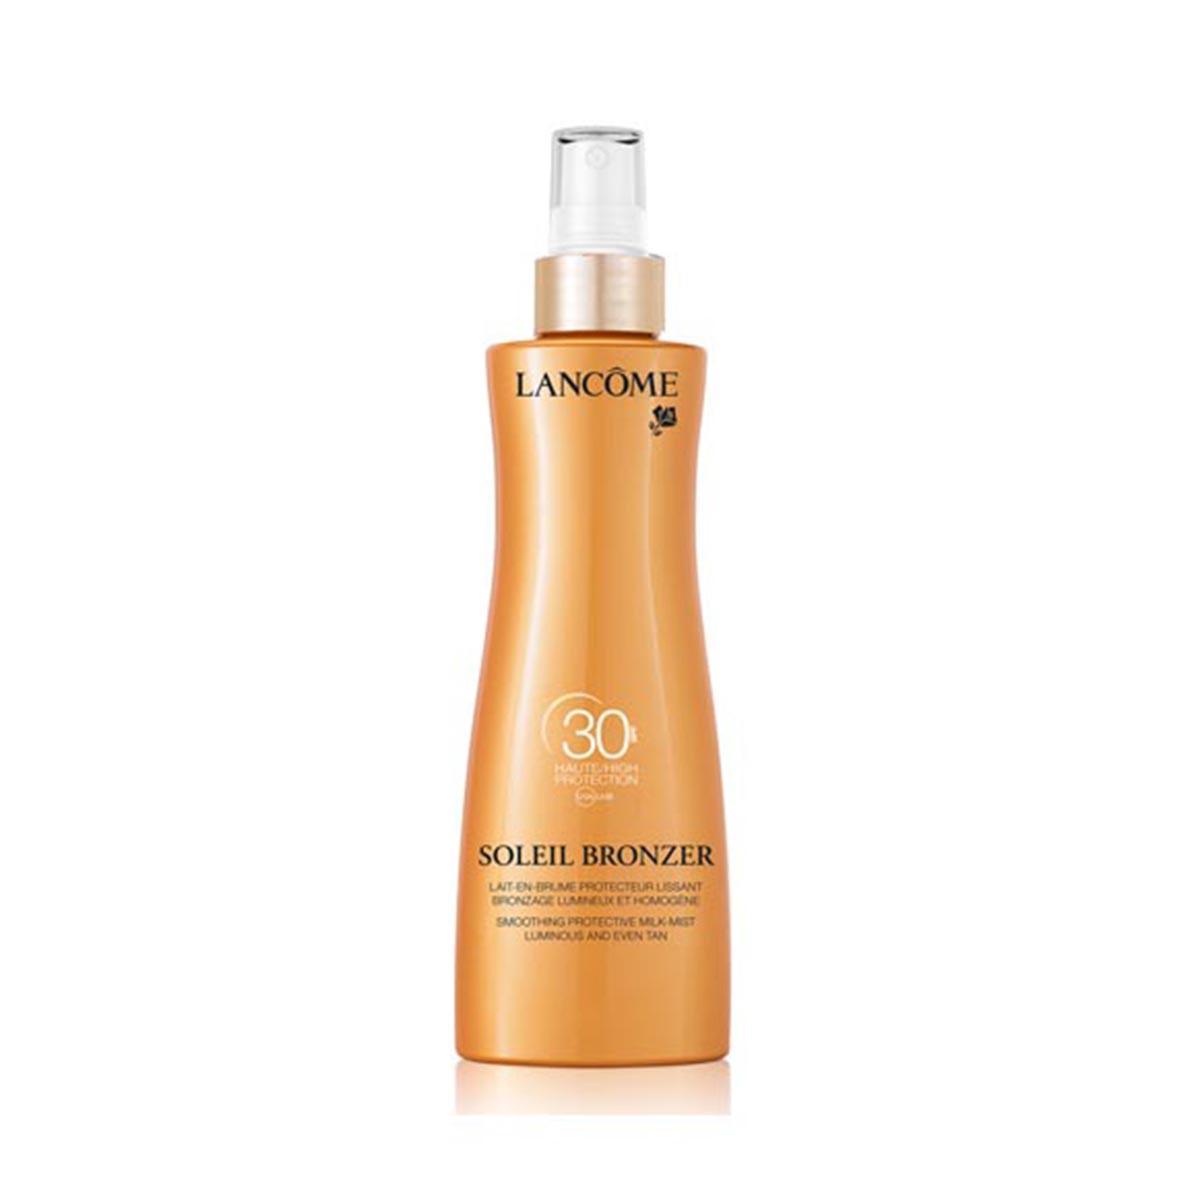 Lancome Soleil Bronzer Spf30 Smoothing Protective Milk Mist Musk Rose Oils 200 Ml